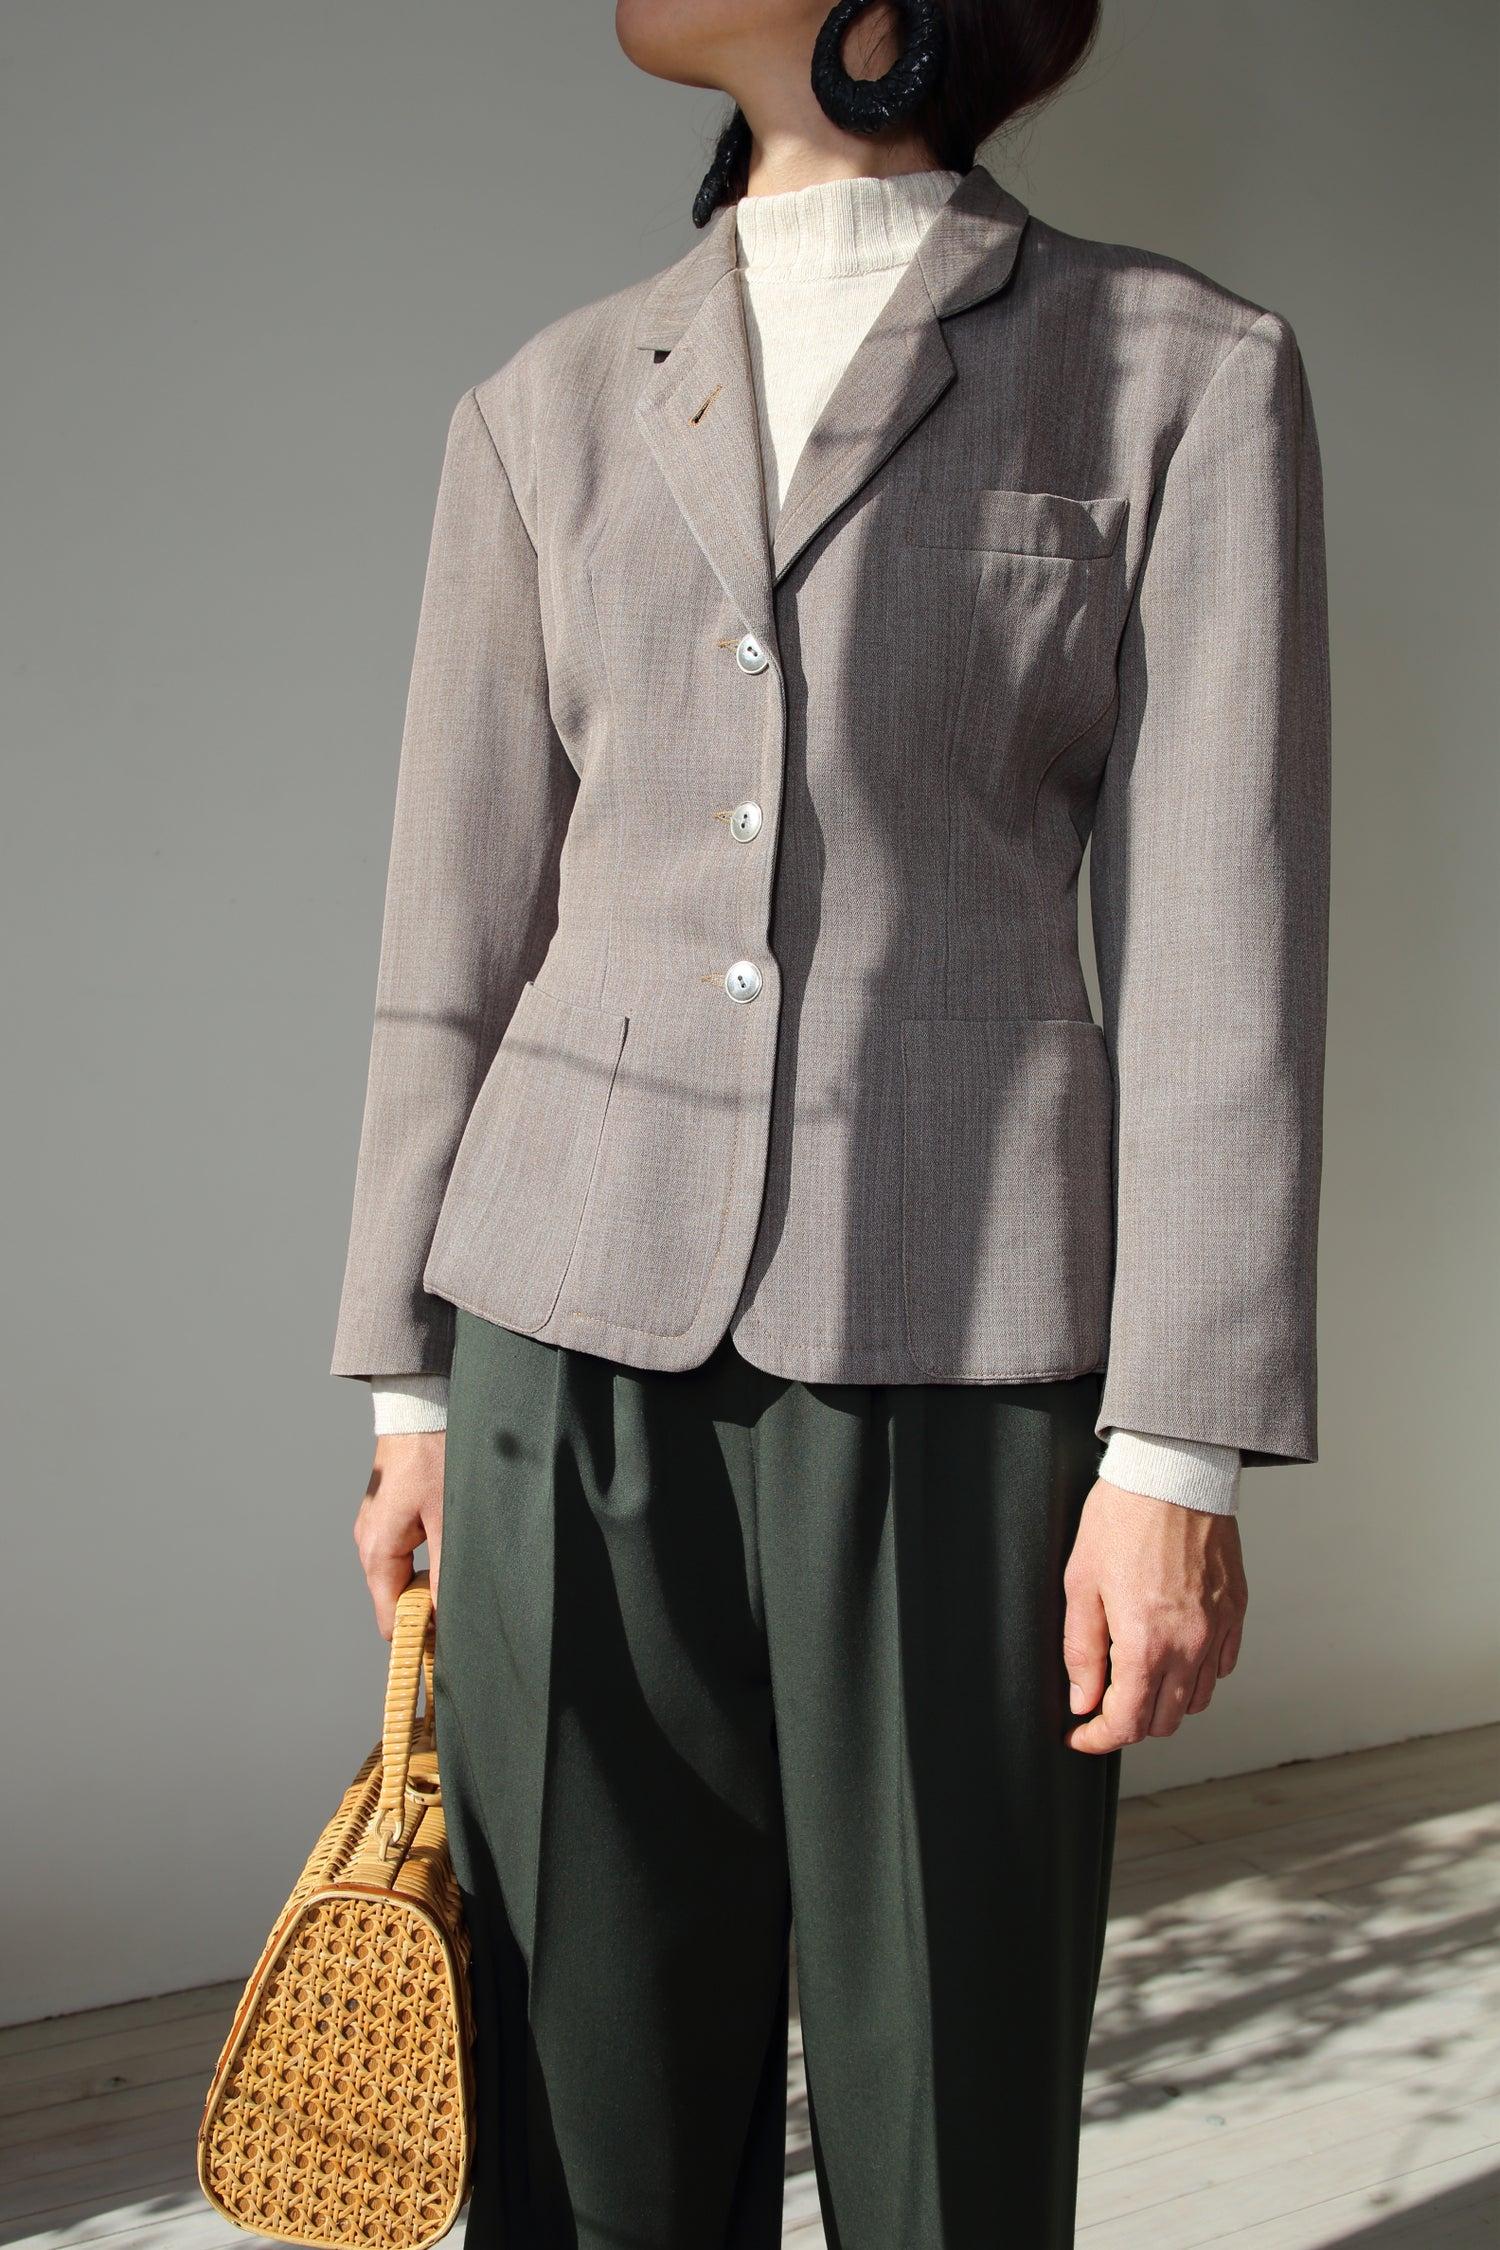 Image of J.P Gaultier brown jacket